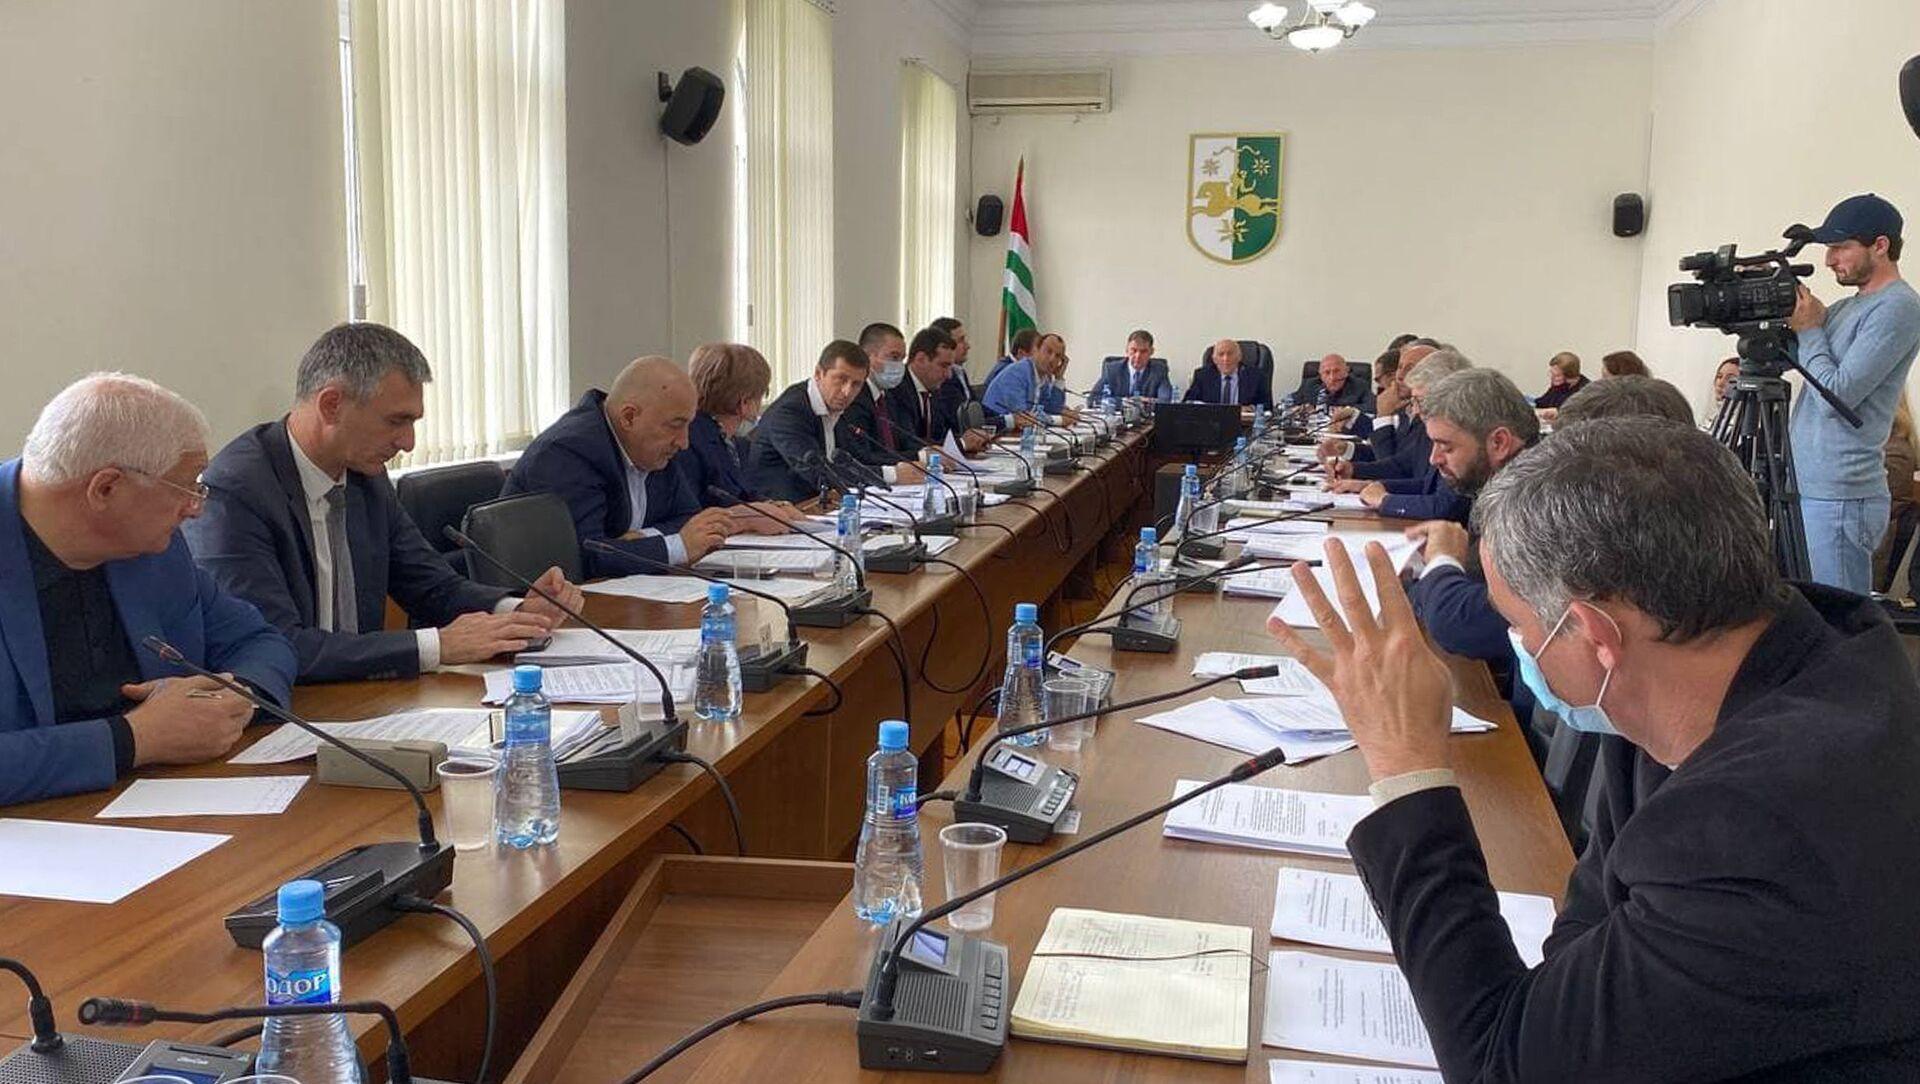 Сессия в парламенте  - Sputnik Абхазия, 1920, 29.09.2021